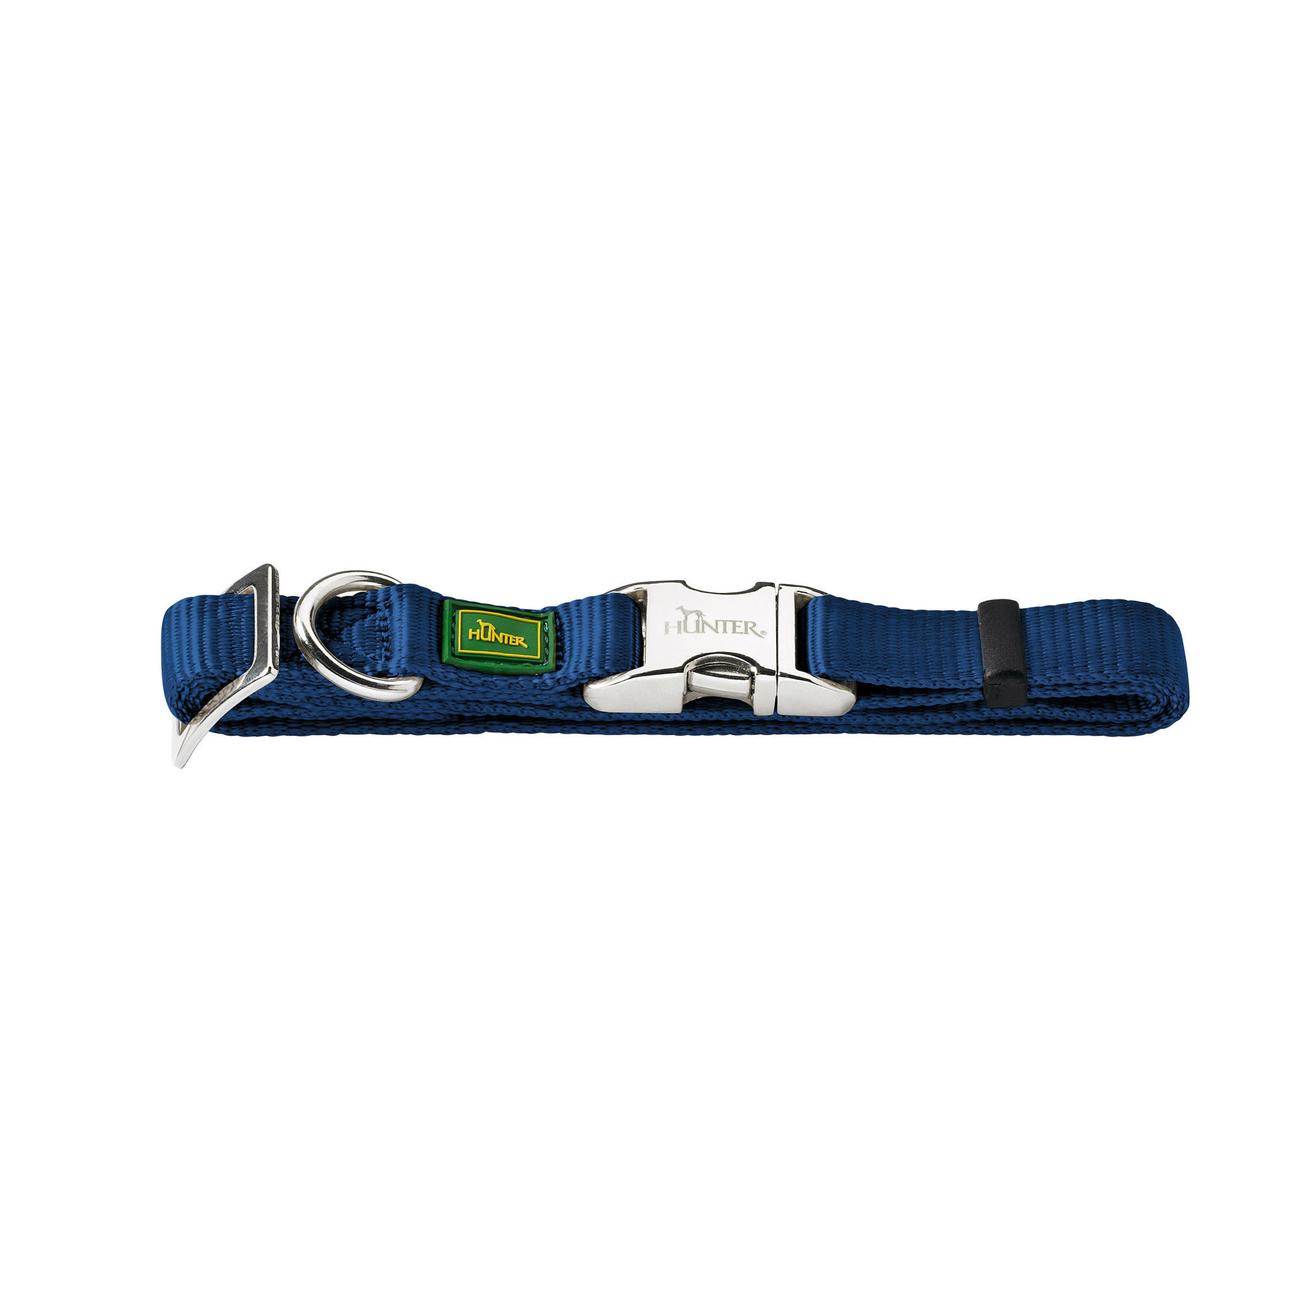 Hunter Halsband Vario Basic Alu Strong Verschluss 46668, Bild 2